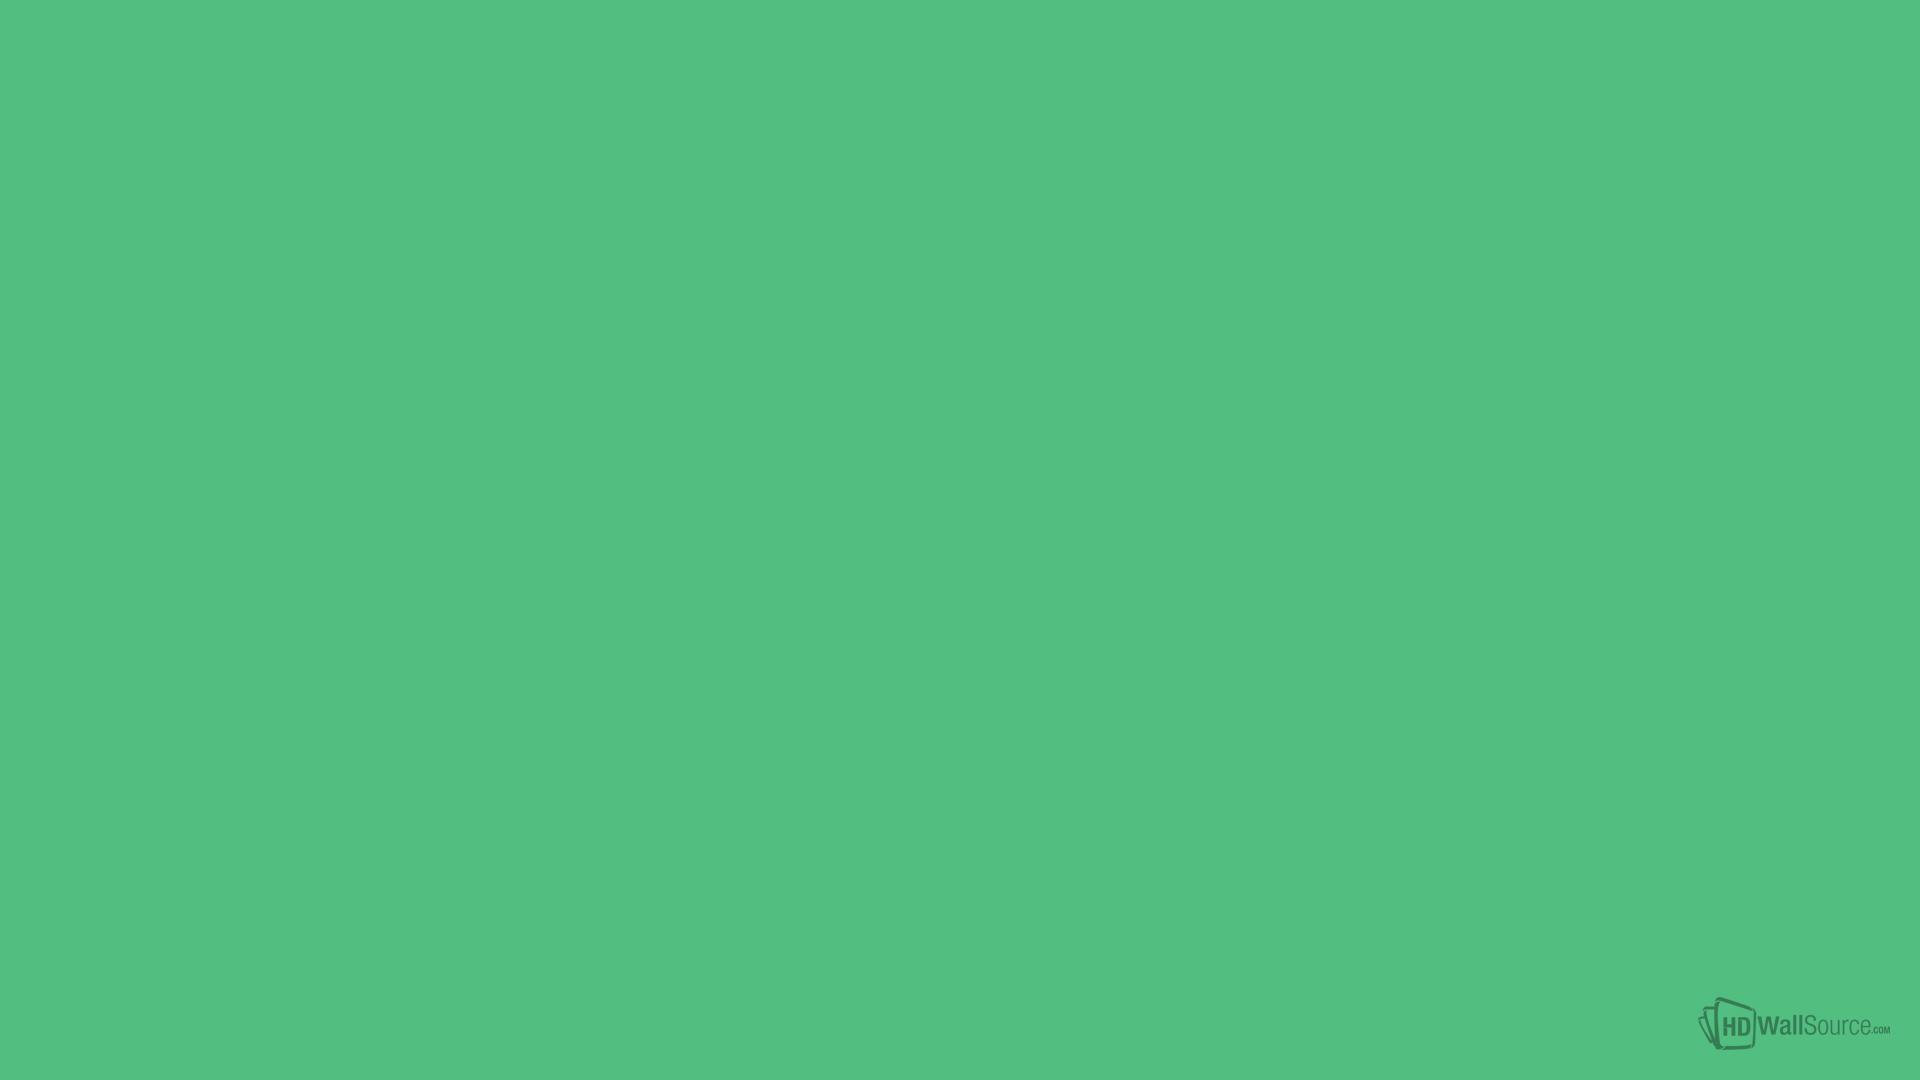 52be80 wallpaper 70805